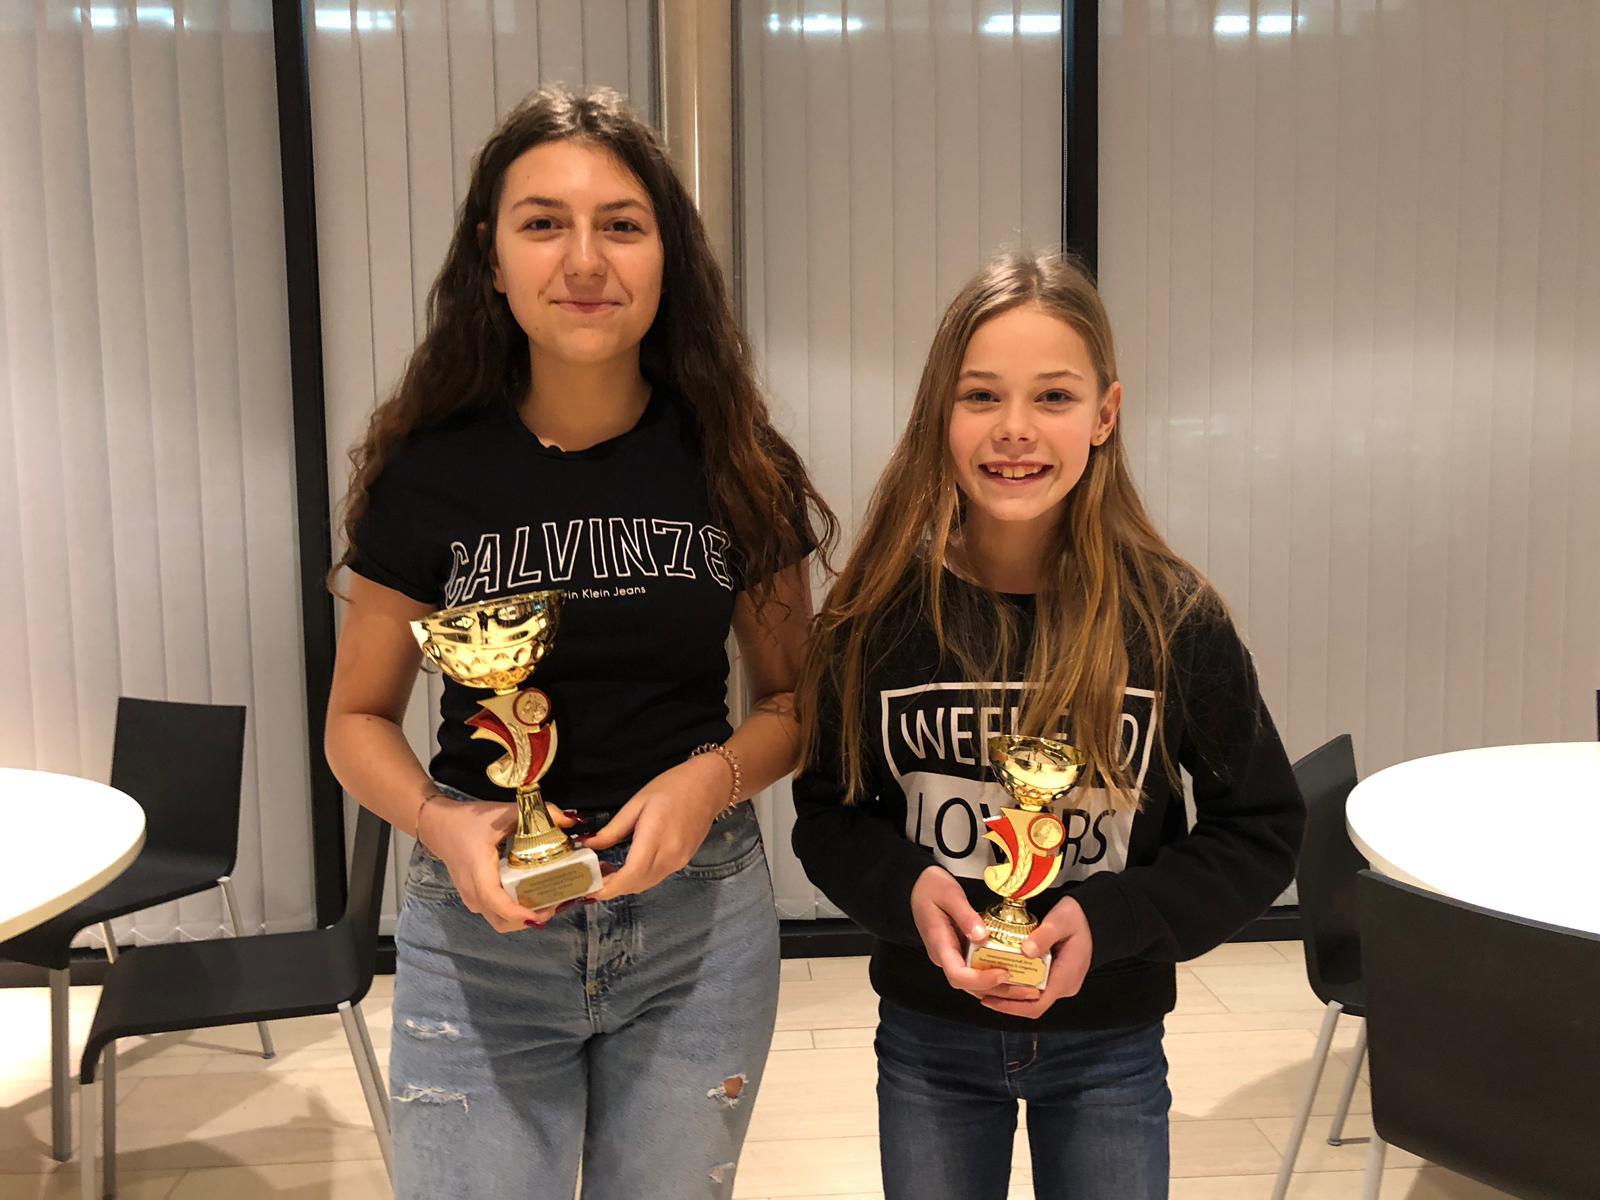 Gymkhana Junioren: 1. Tamara, 2. Larissa (abwesend), 3. Laura